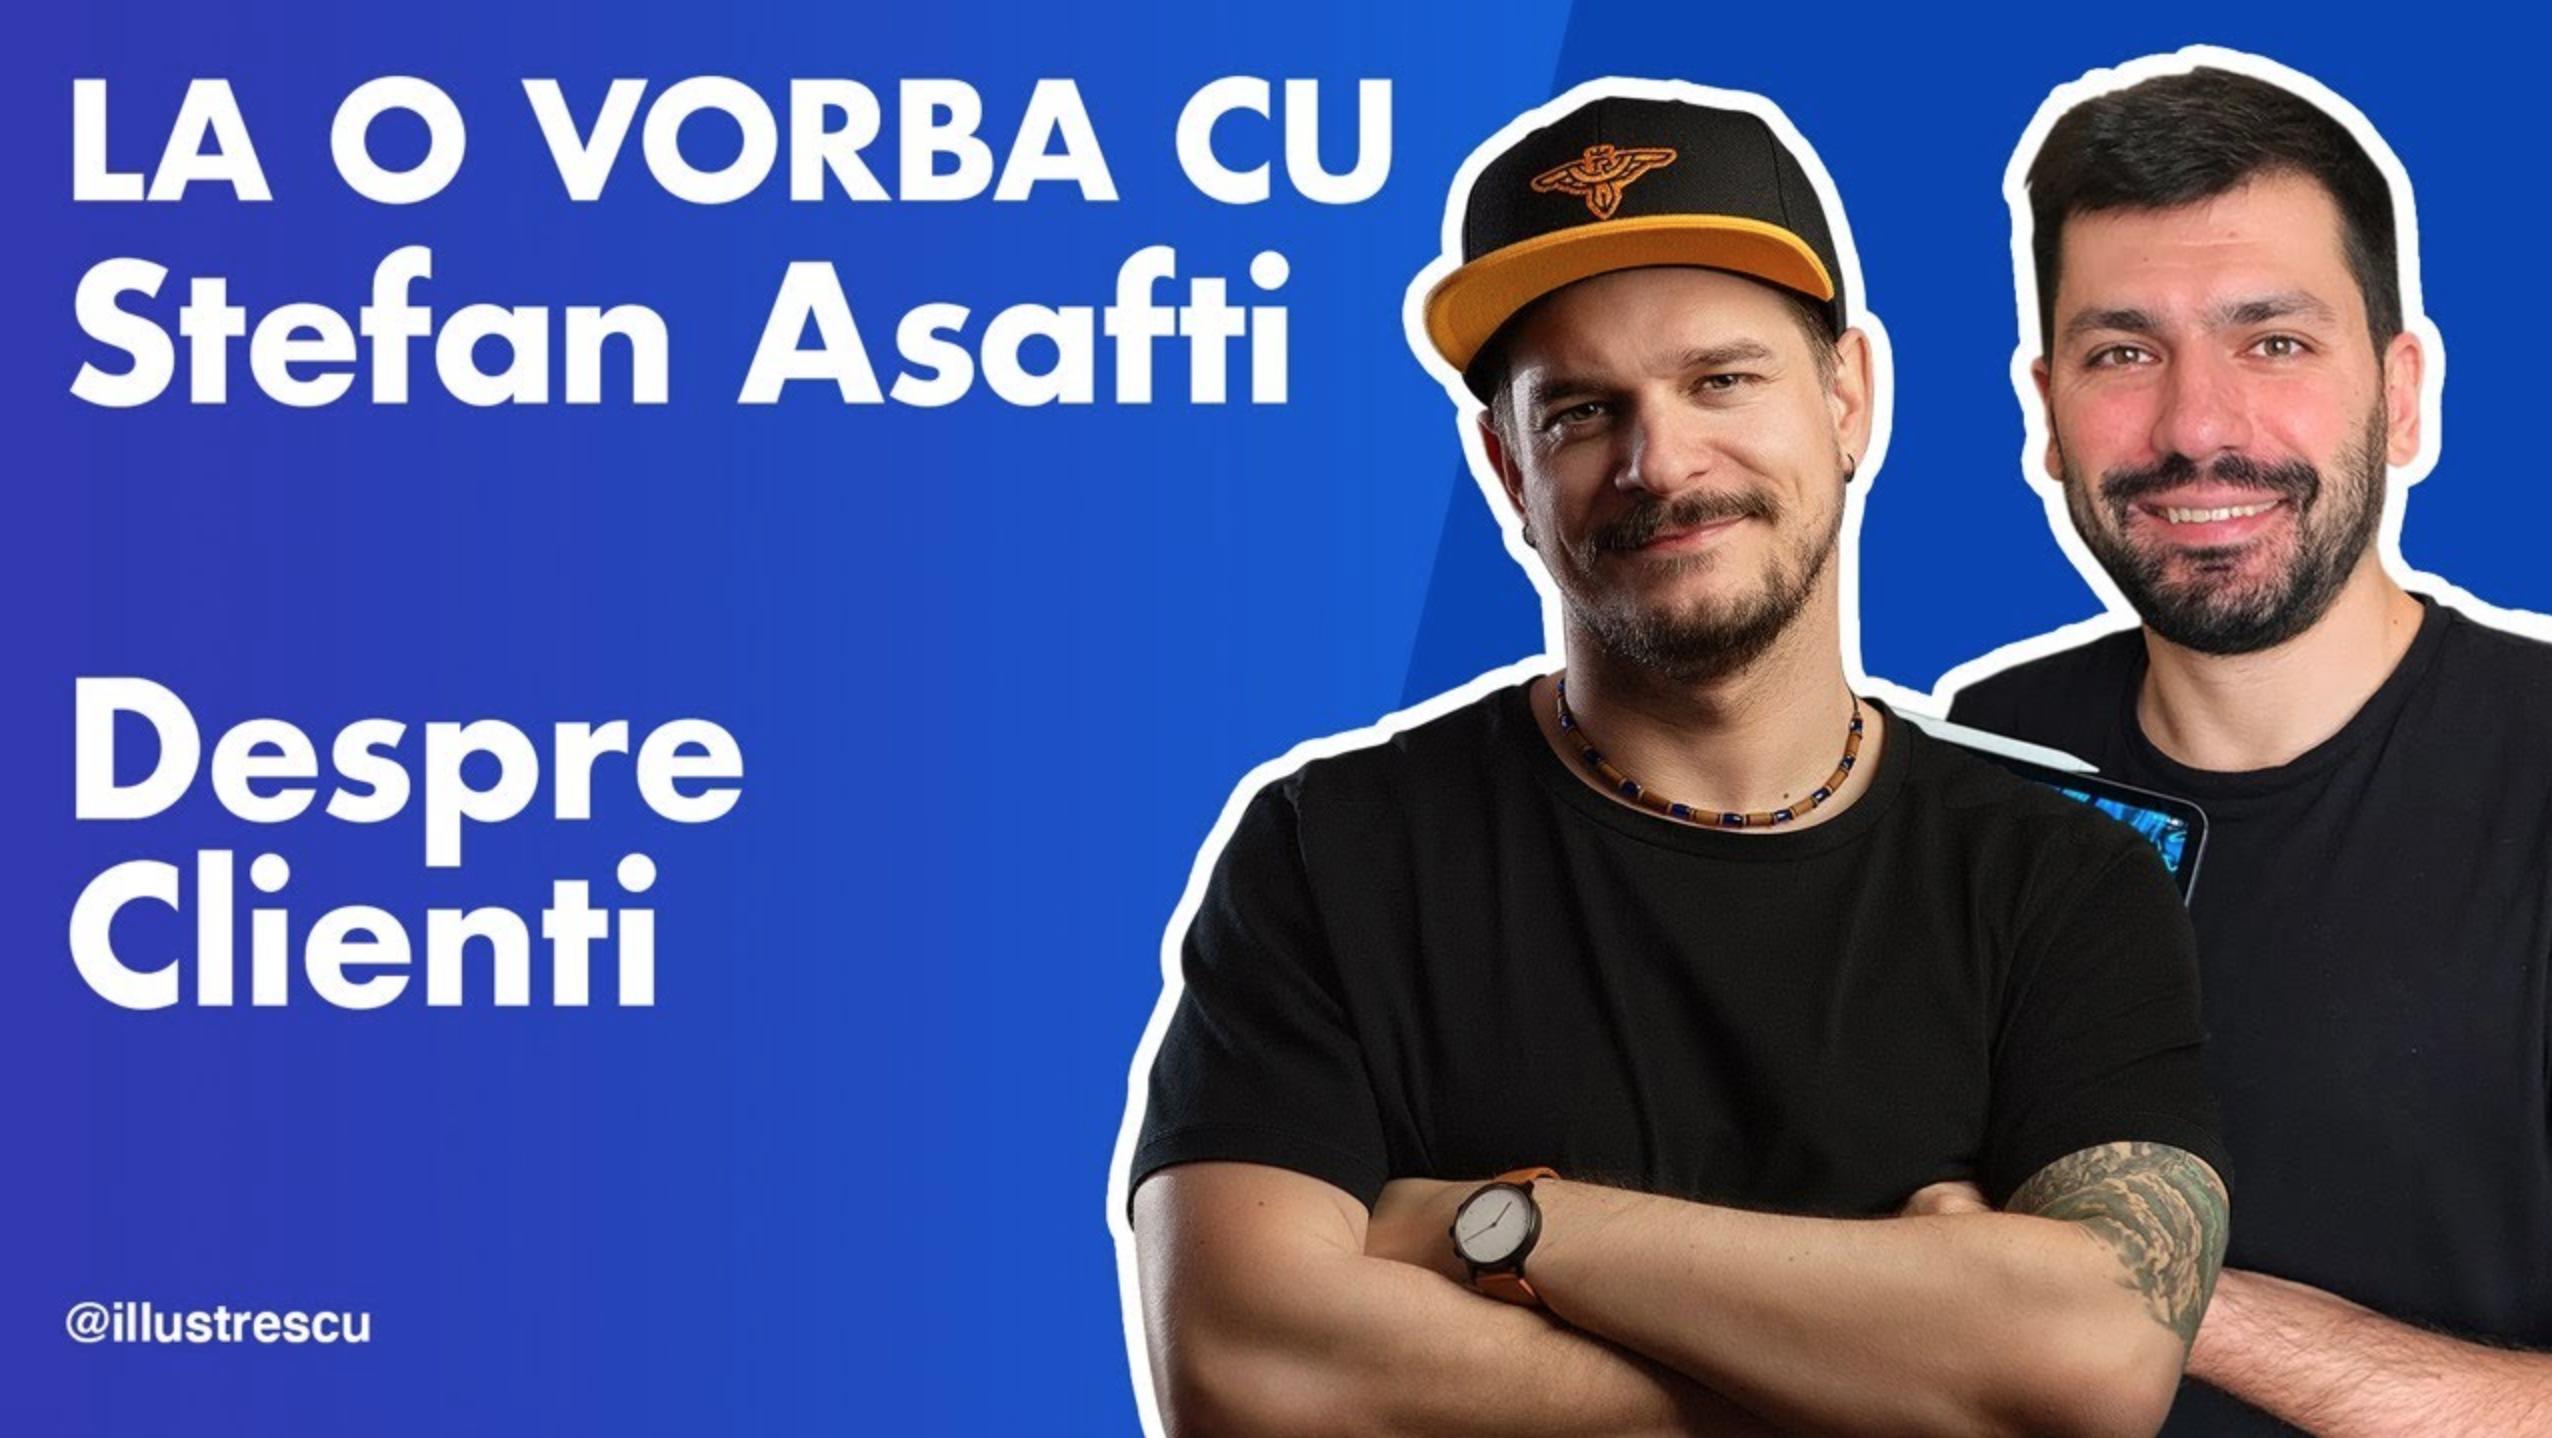 La o vorba cu Stefan Asafti [LIVE] Pilot – Despre Clienti